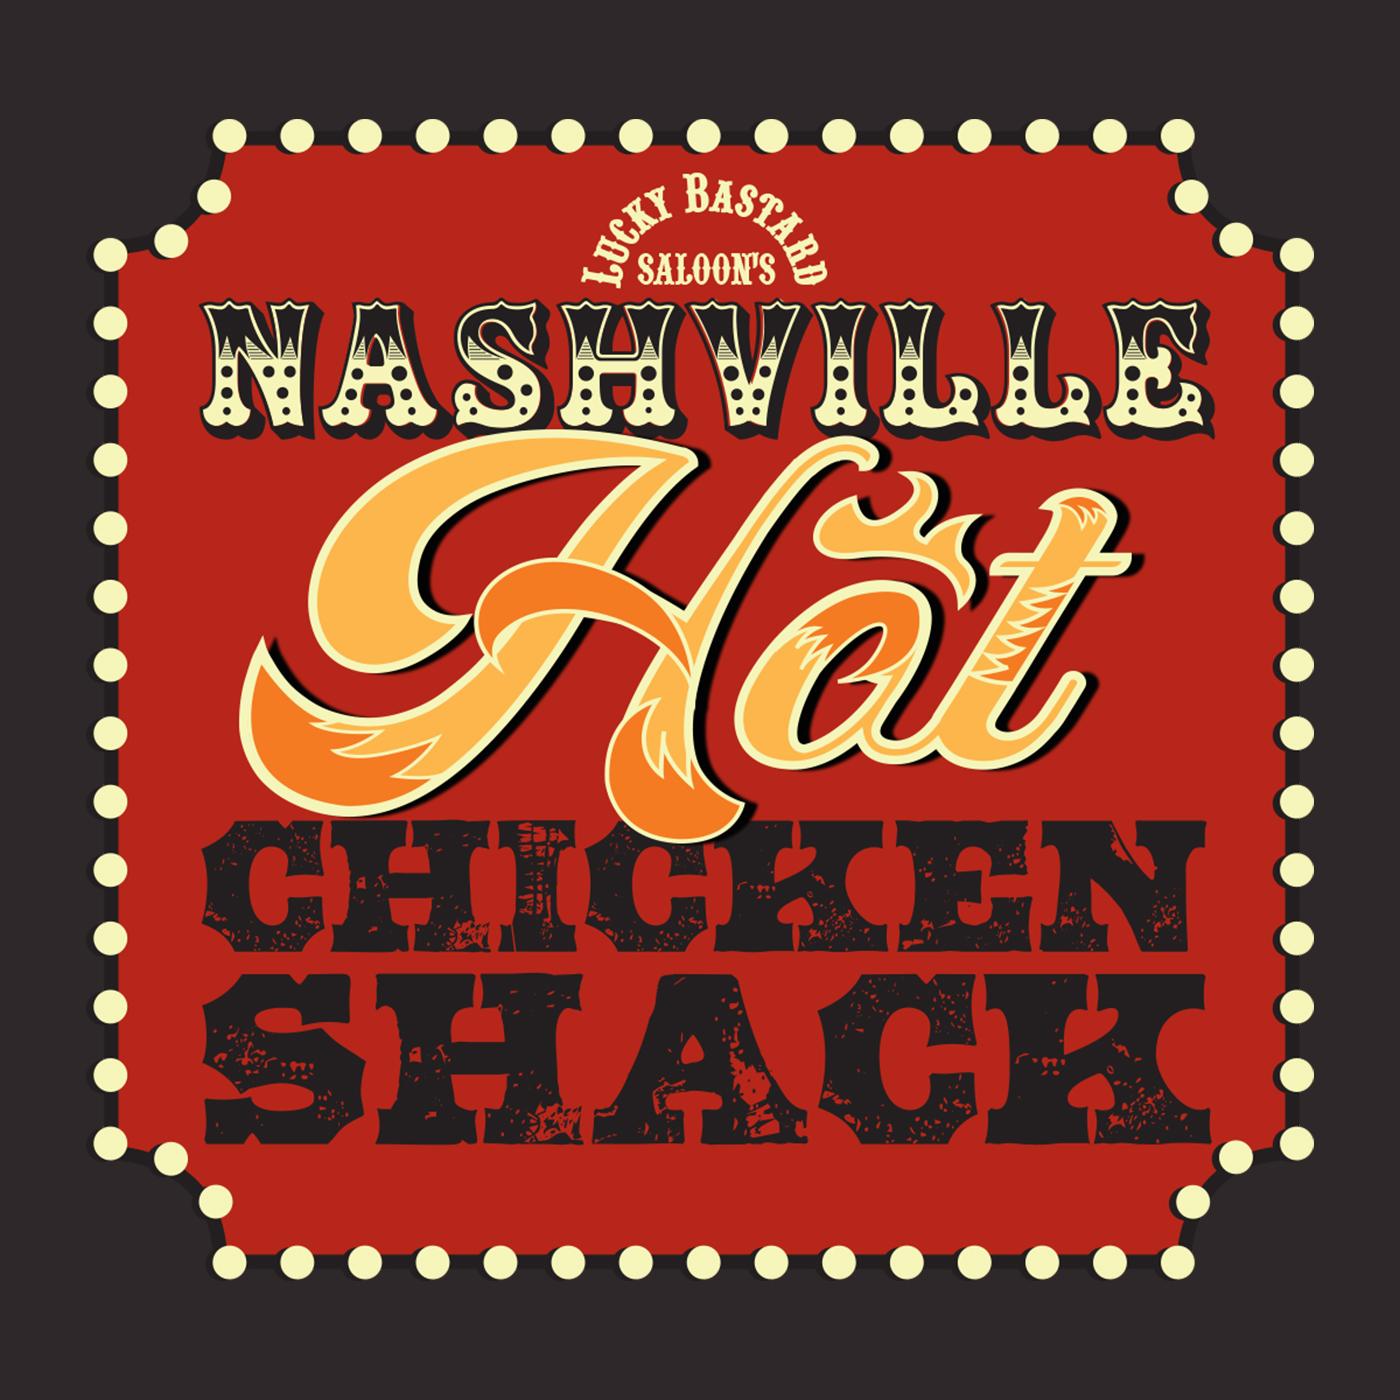 Nashville Hot Chicken Salad